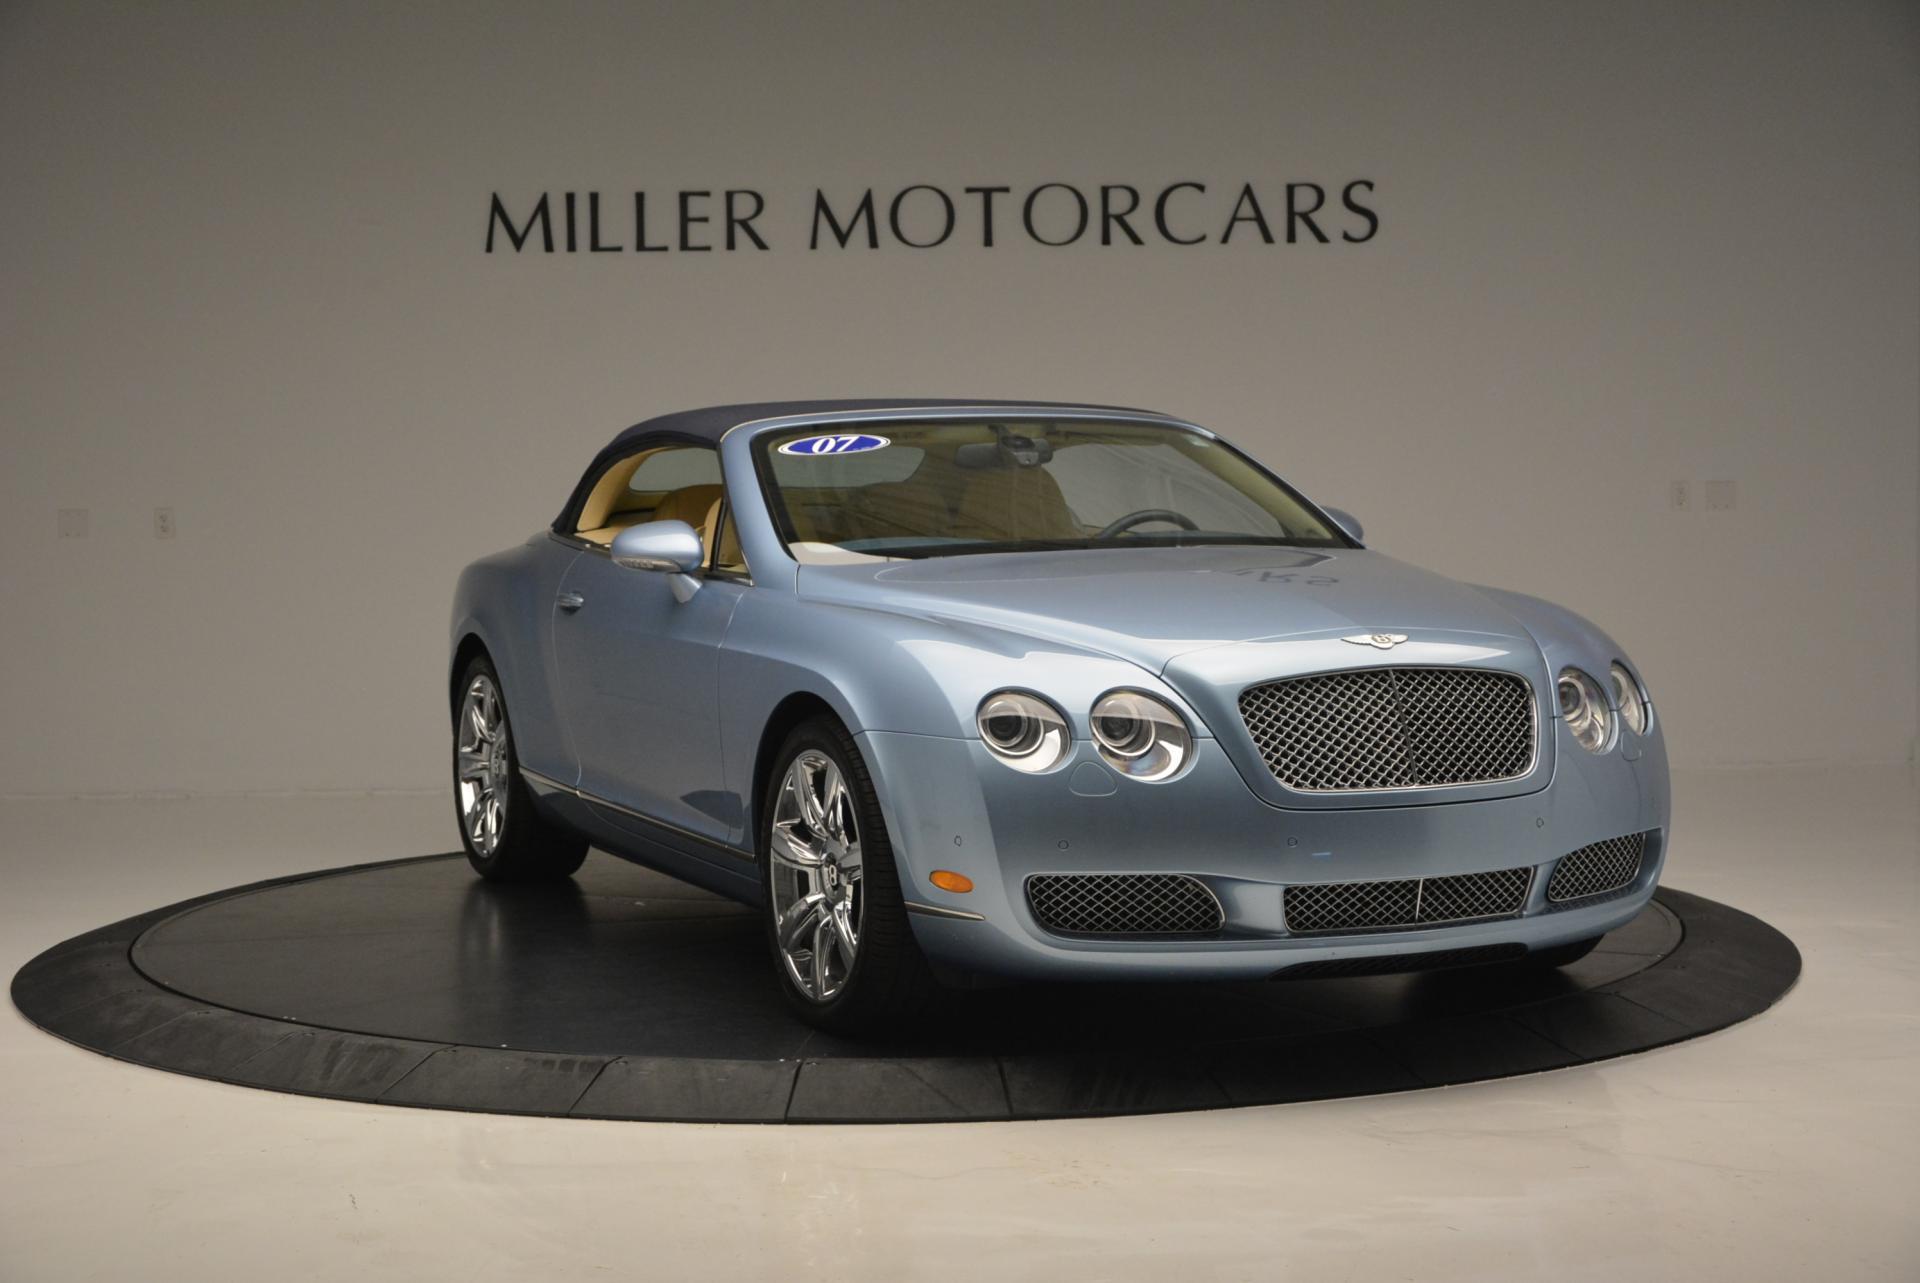 Used 2007 Bentley Continental GTC  For Sale In Westport, CT 495_p23